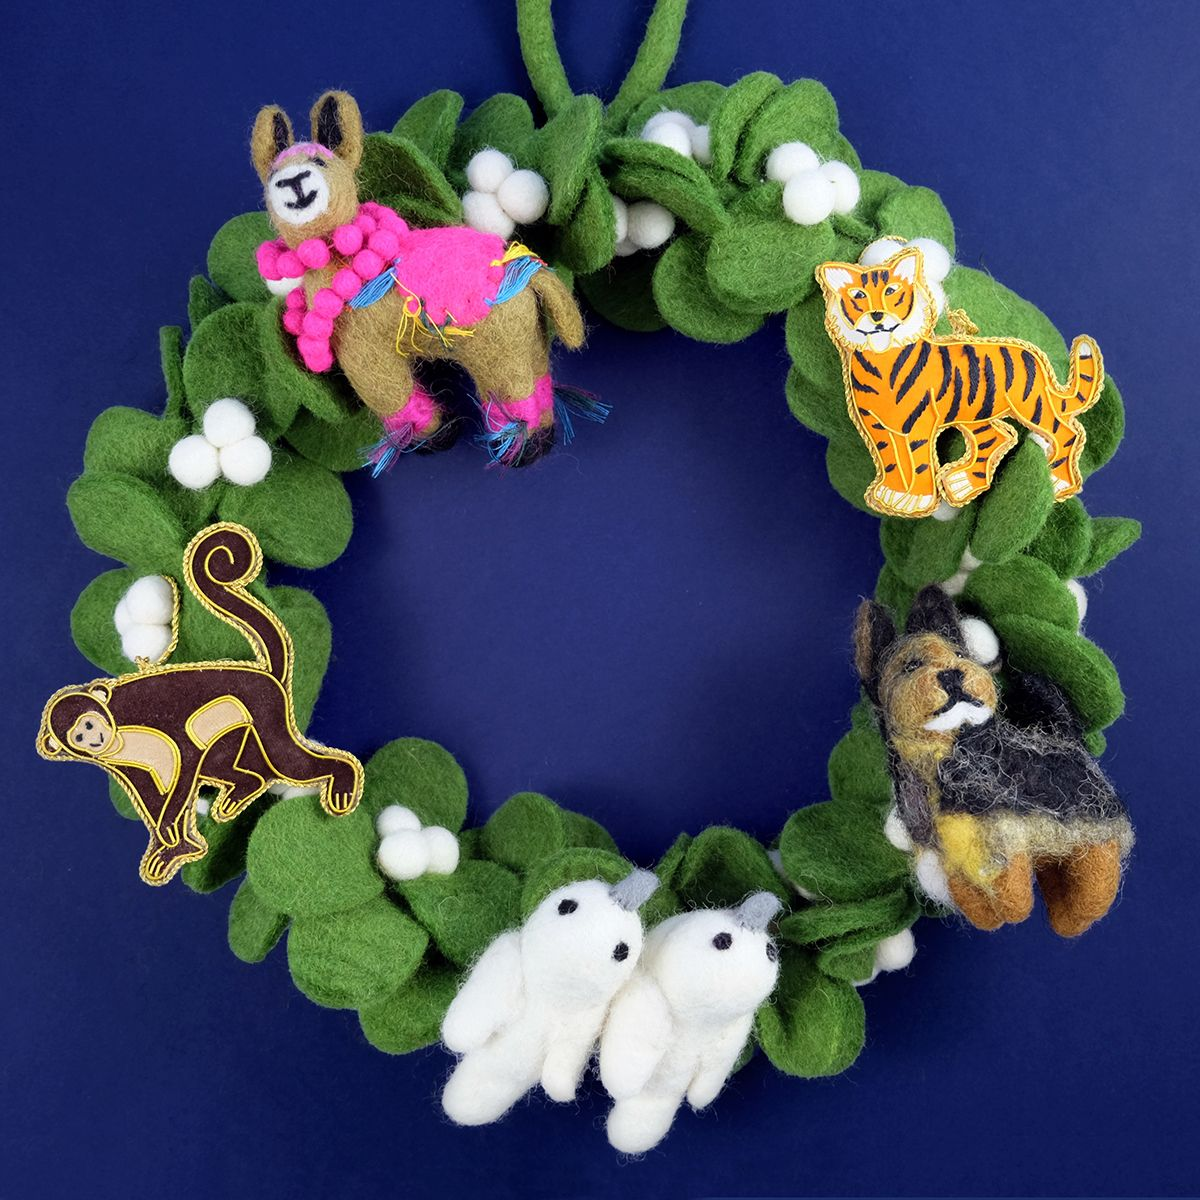 Hawaiian Christmas Tree Topper: Pin On Gifts